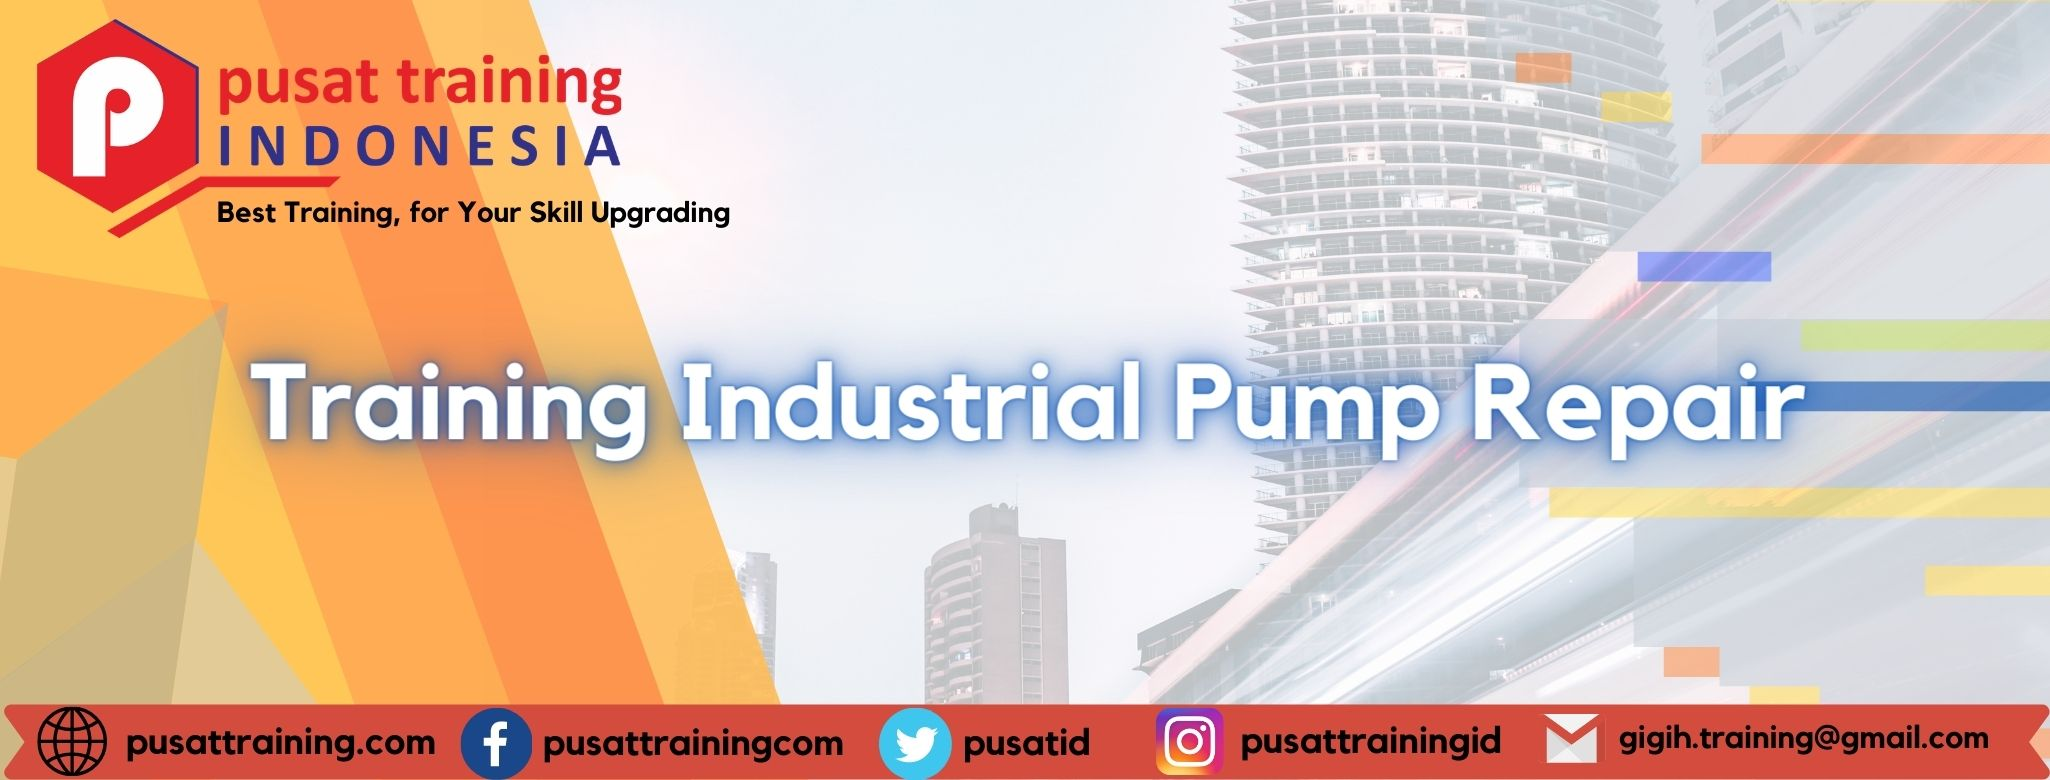 Training-Industrial-Pump-Repair